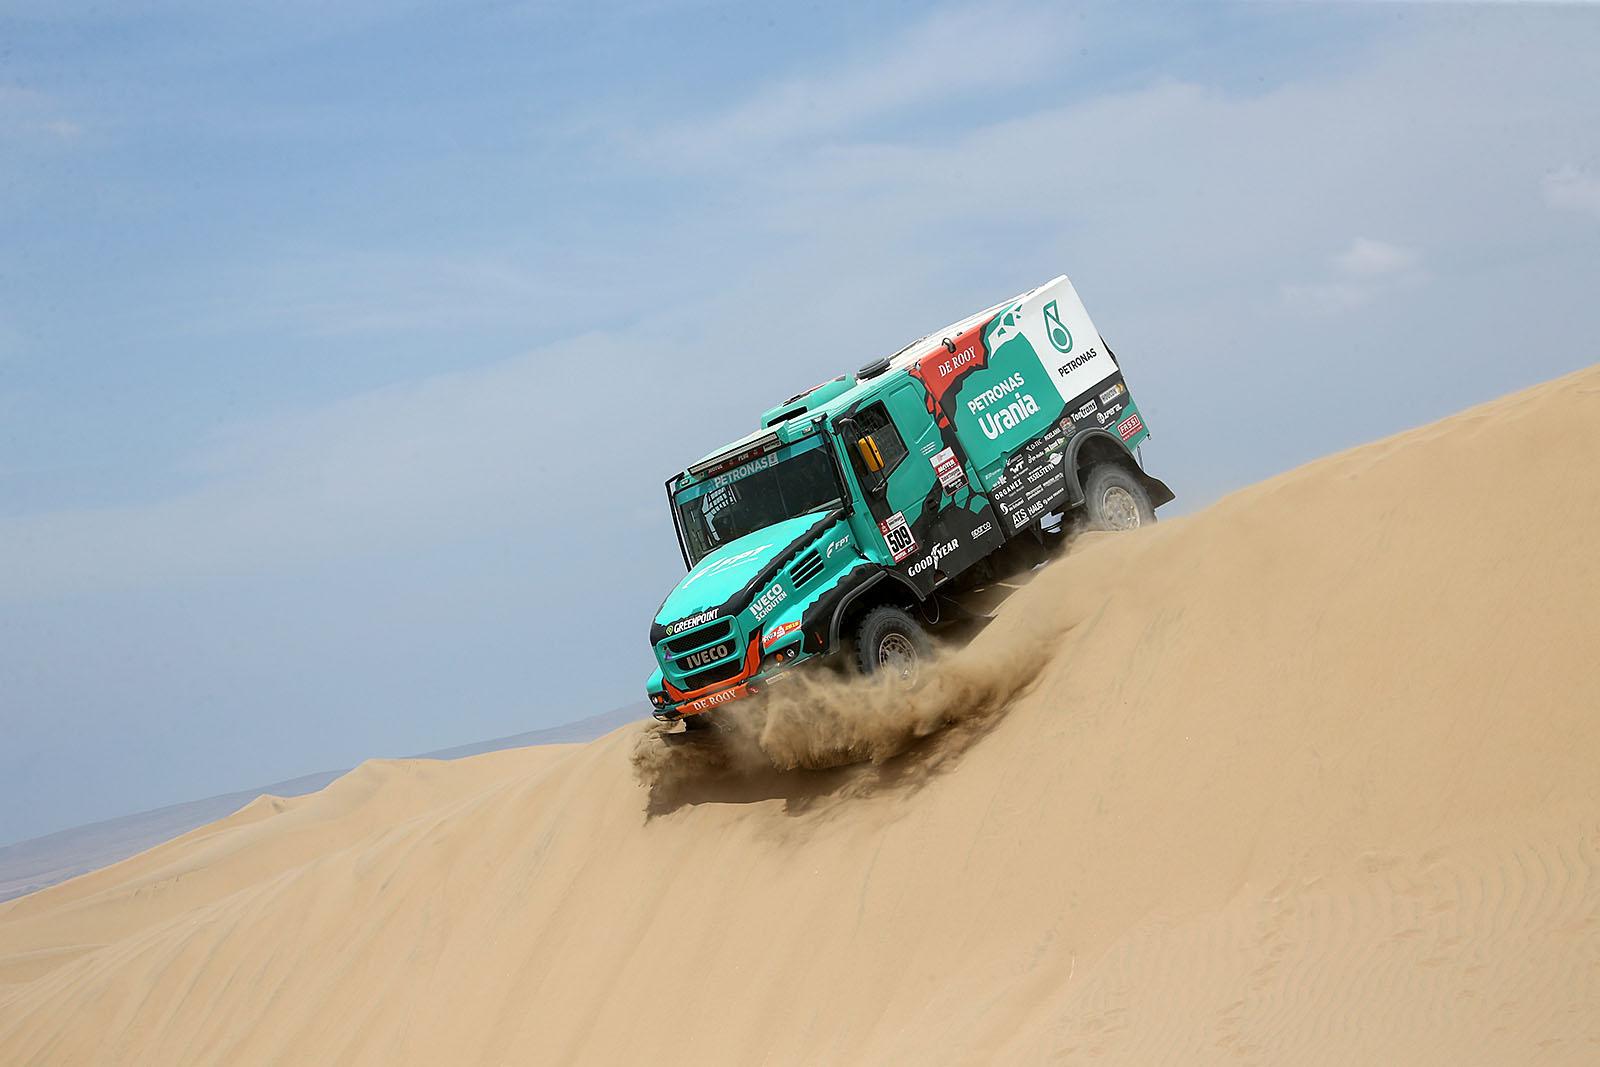 El Dakar 2020 se correrá en Arabia Saudí